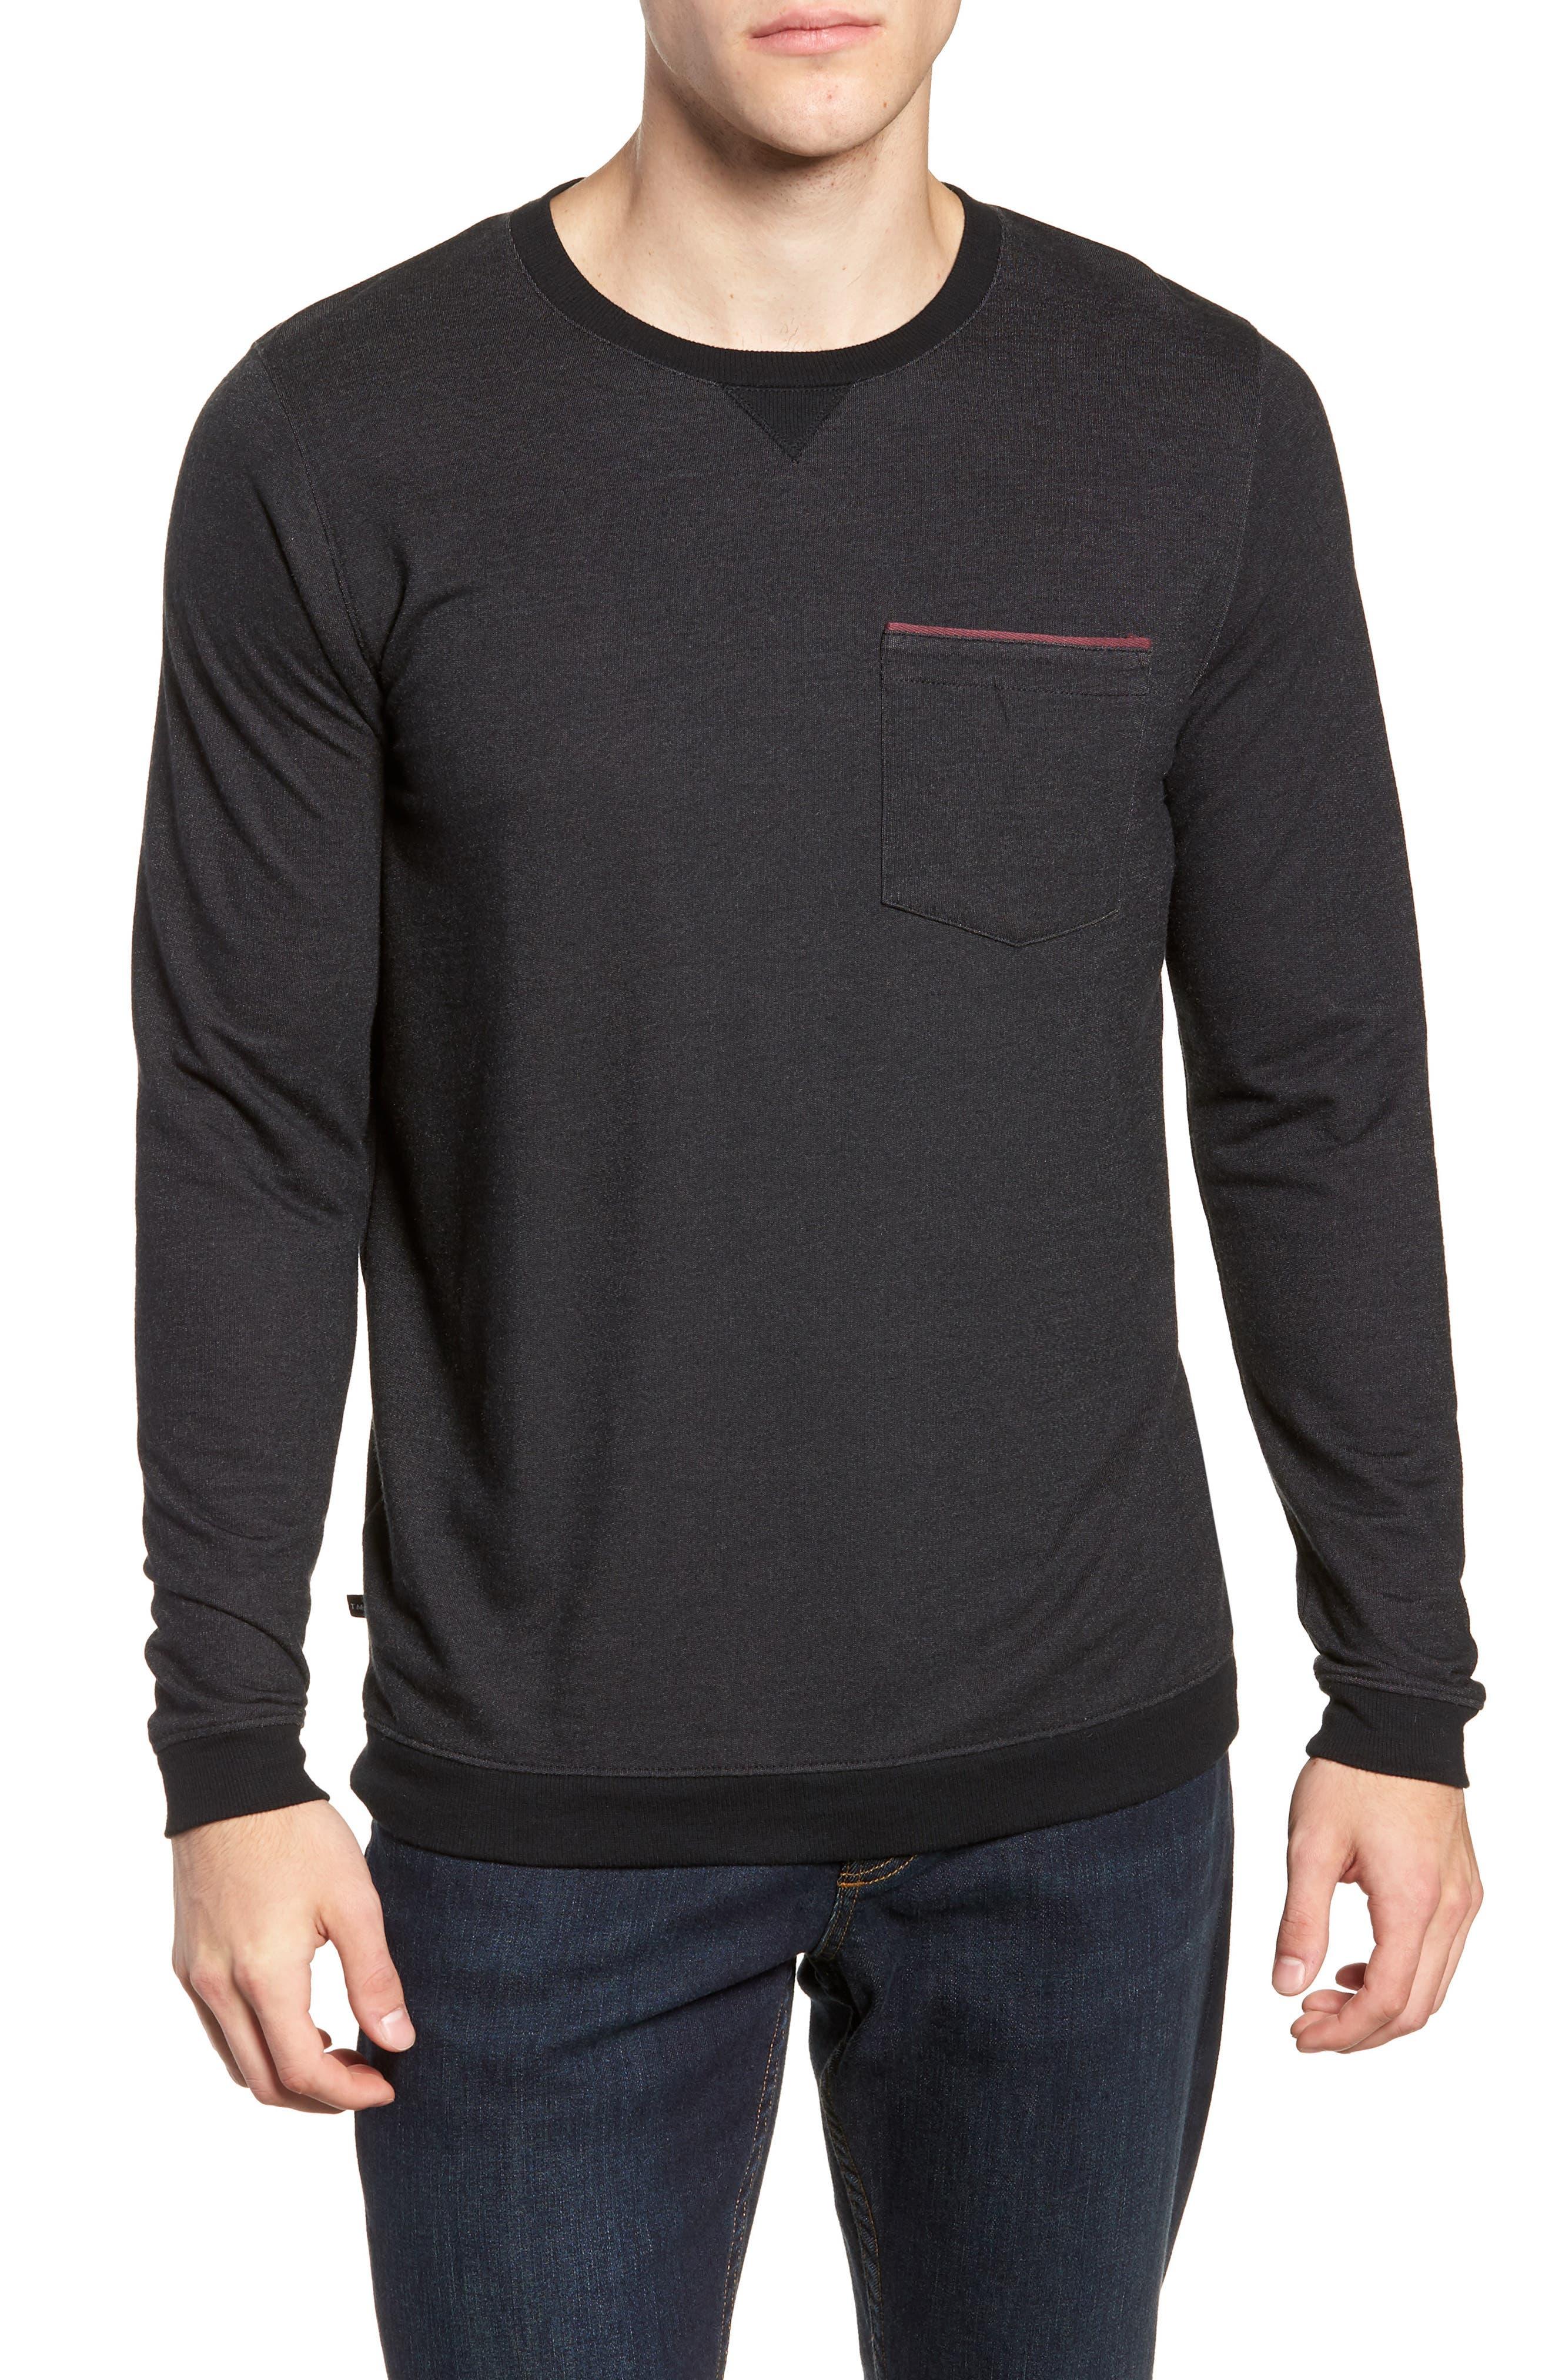 Lanegan Long Sleeve T-Shirt,                             Main thumbnail 1, color,                             BLACK/ WINETASTING